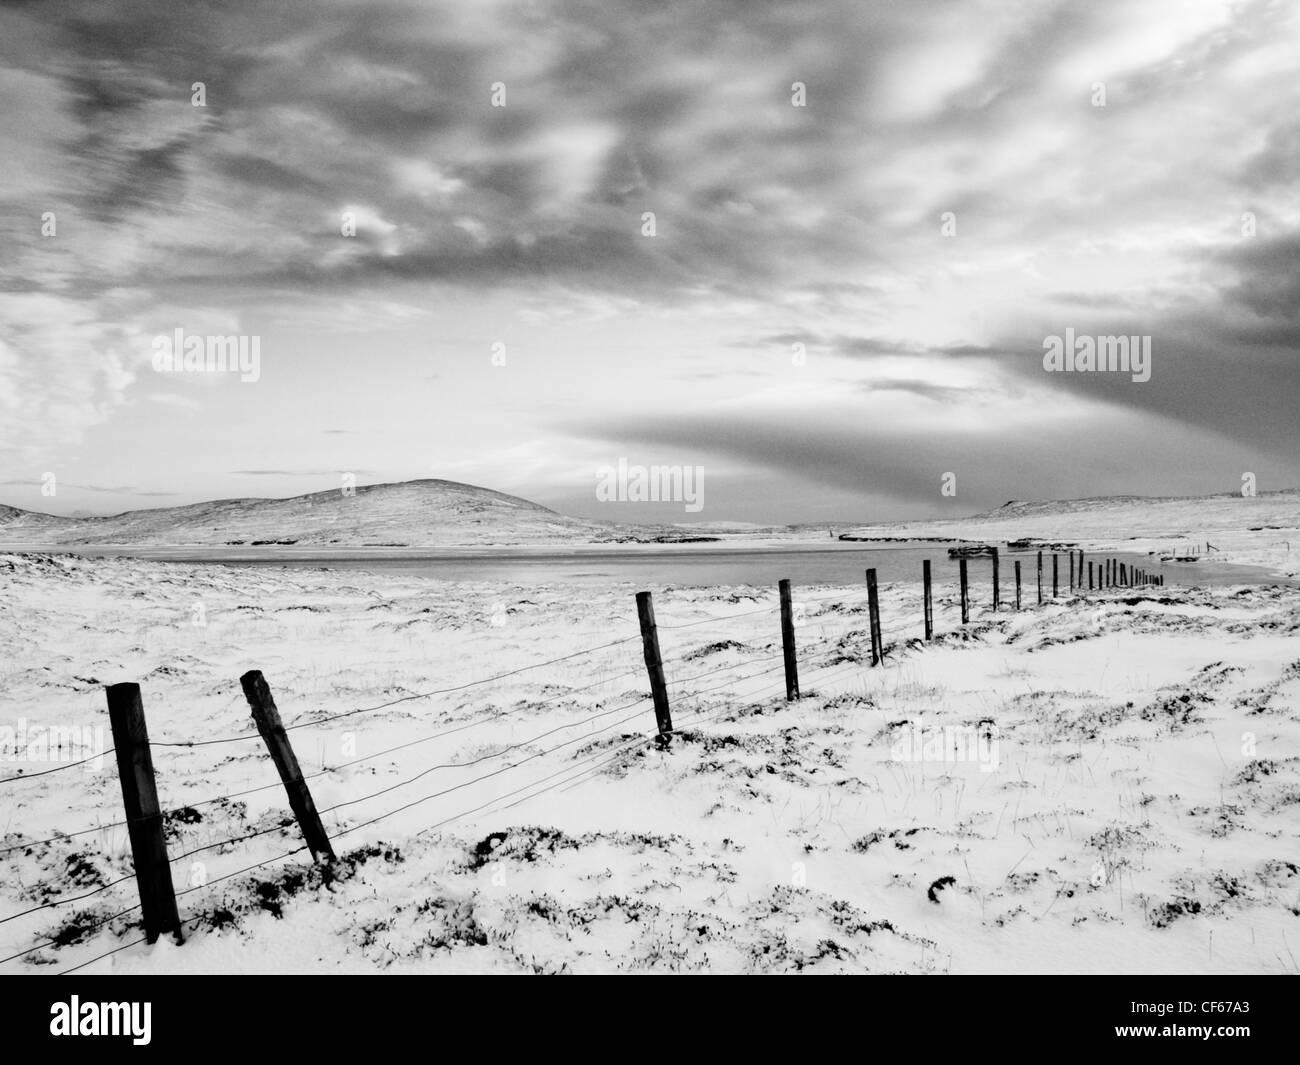 Overcast snowy day at Tresbister Ness on Shetland. - Stock Image